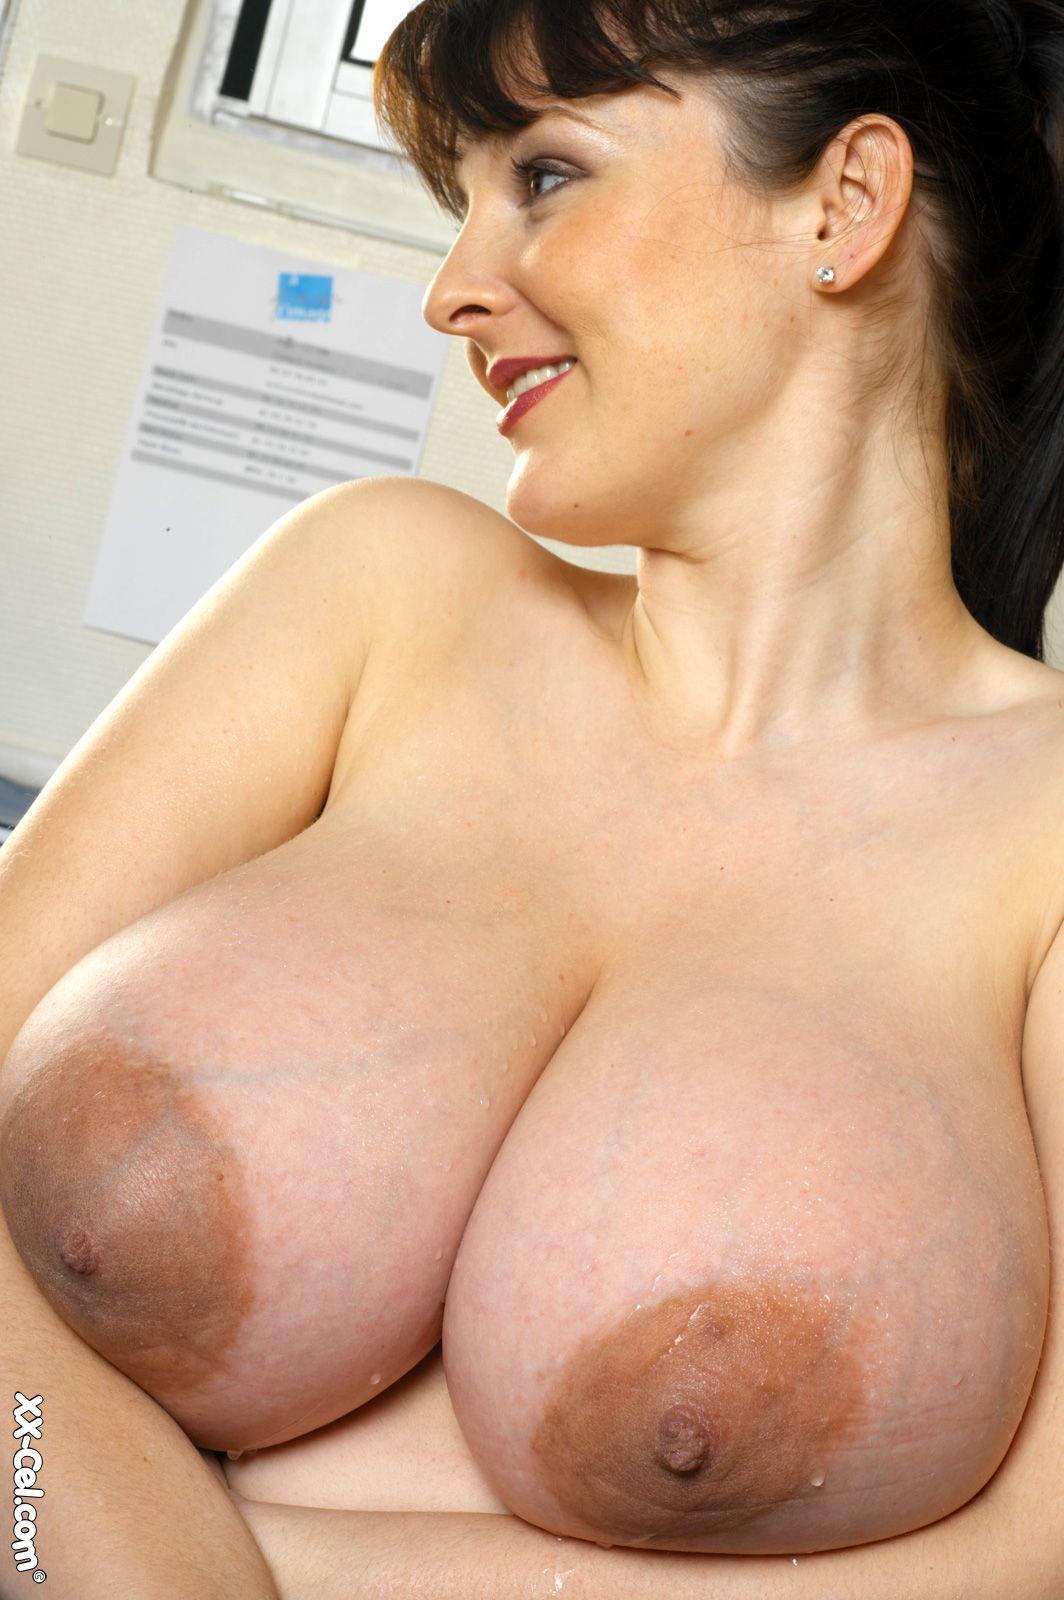 sexy older nude mature women